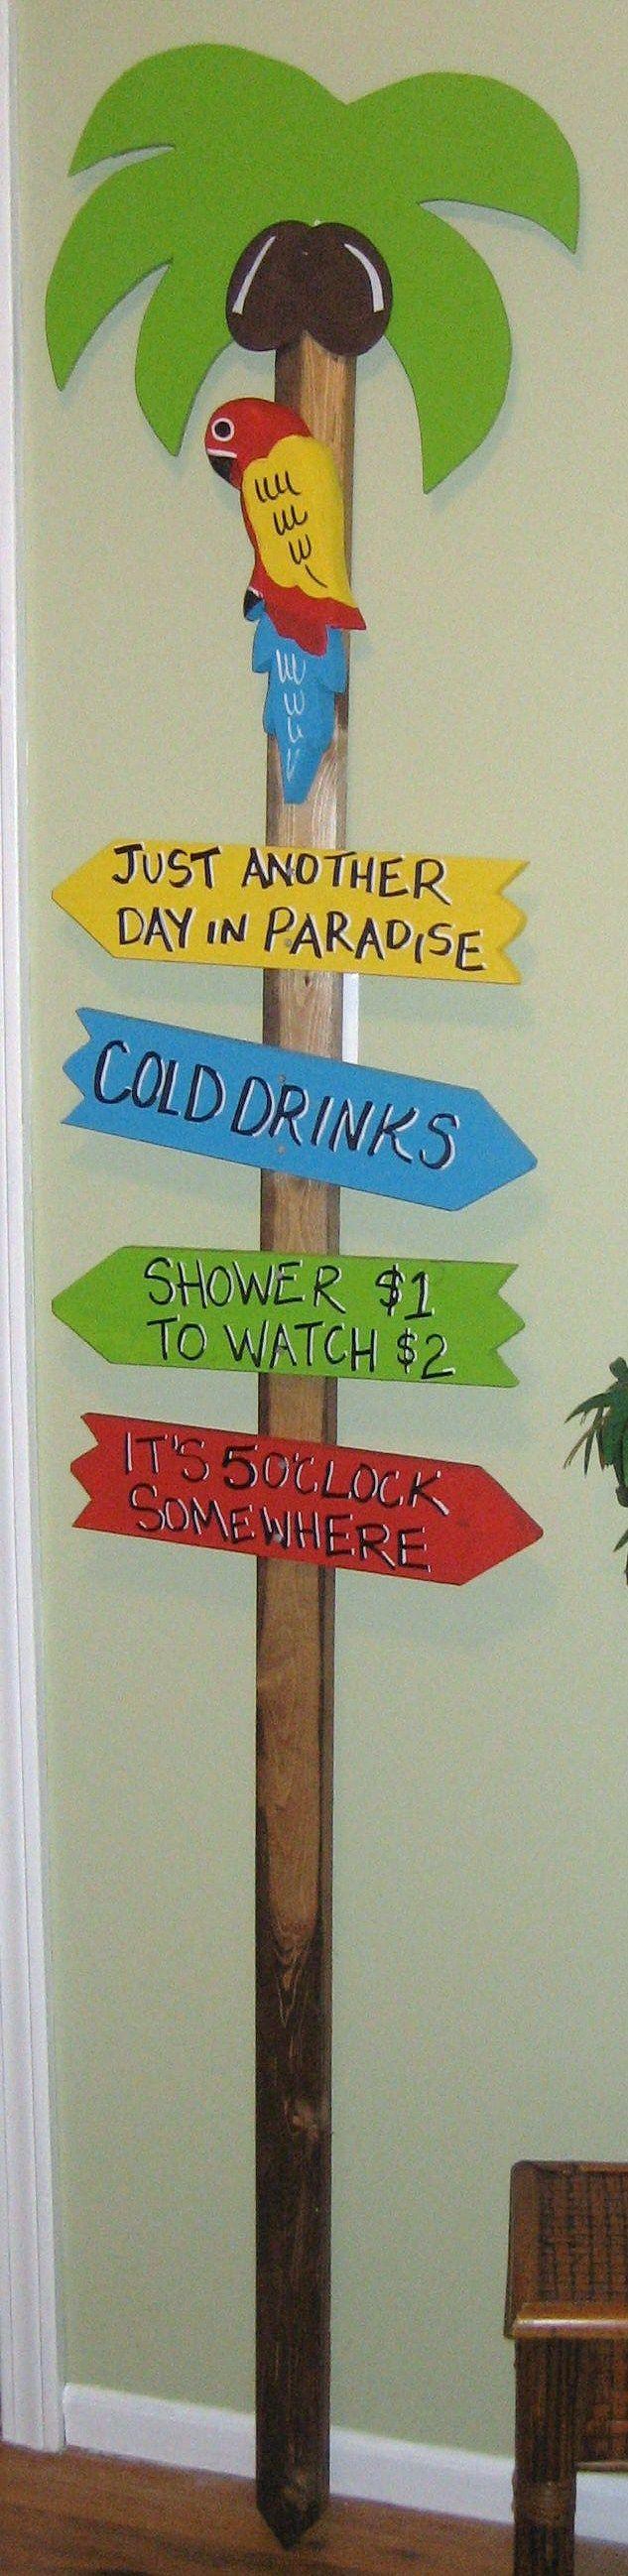 Tropical Tiki Bars - Tiki Bar Signs                Ask us about customizing your sign!